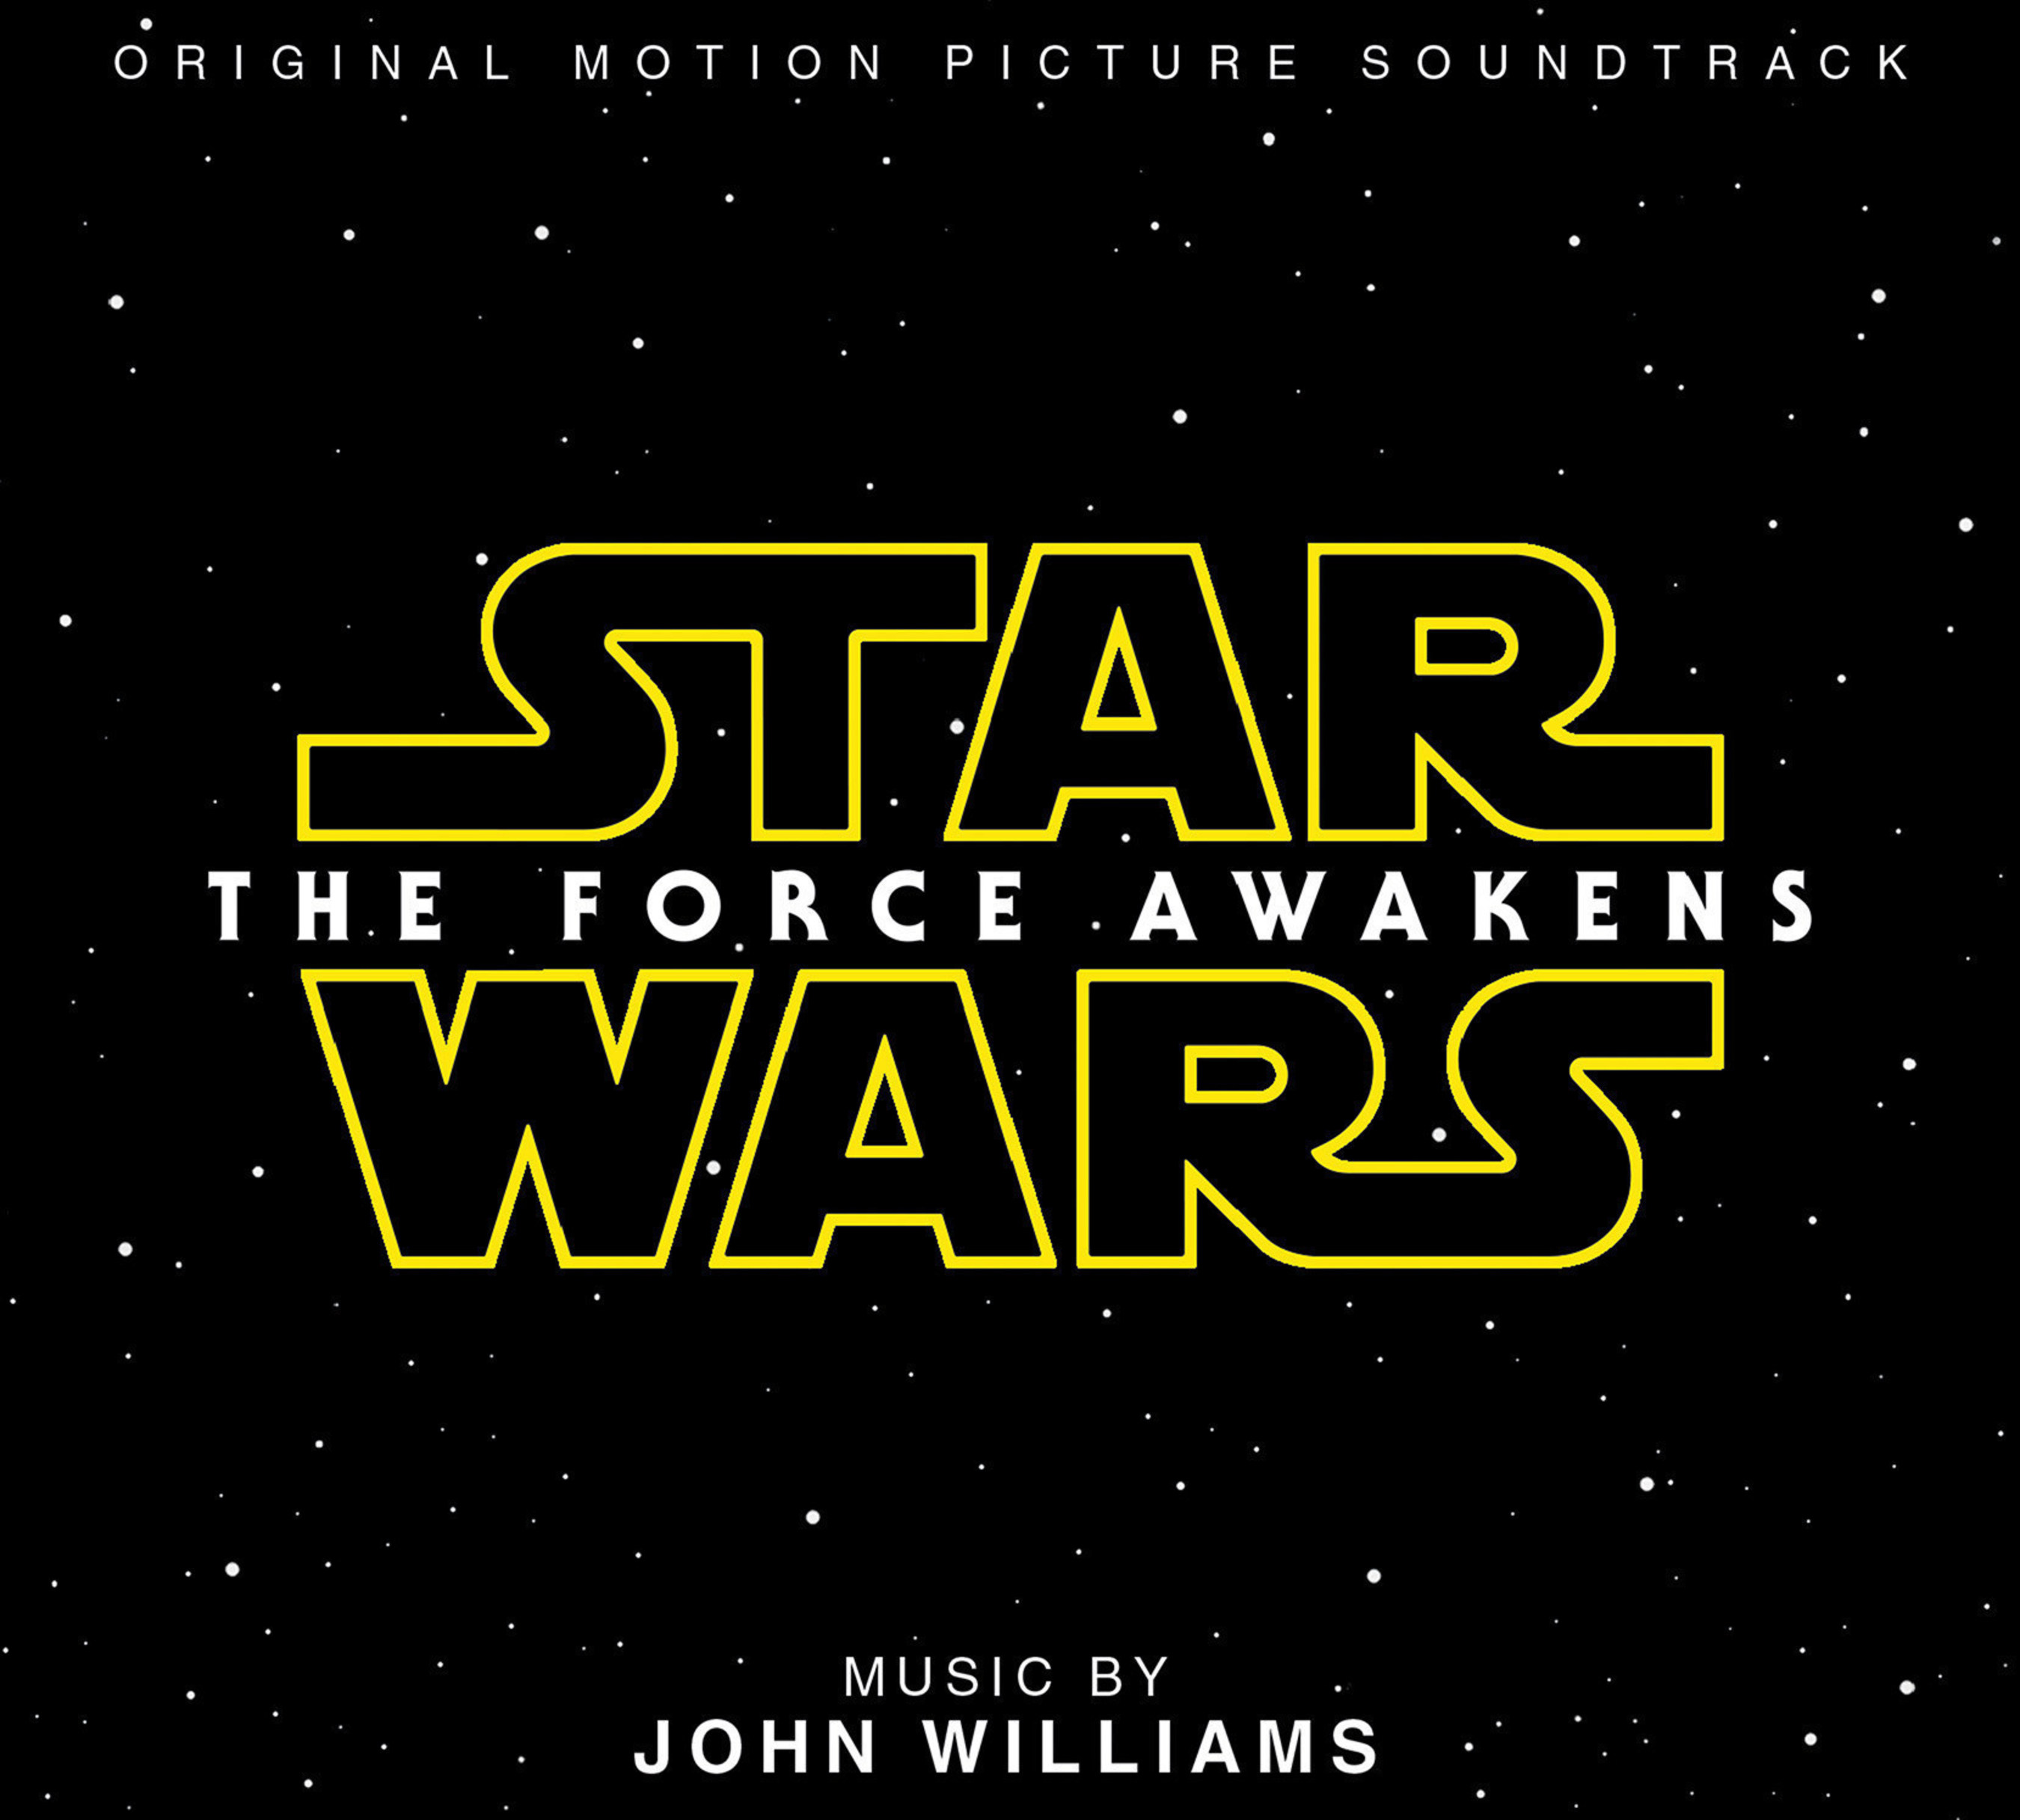 STAR WARS: THE FORCE AWAKENS cover art